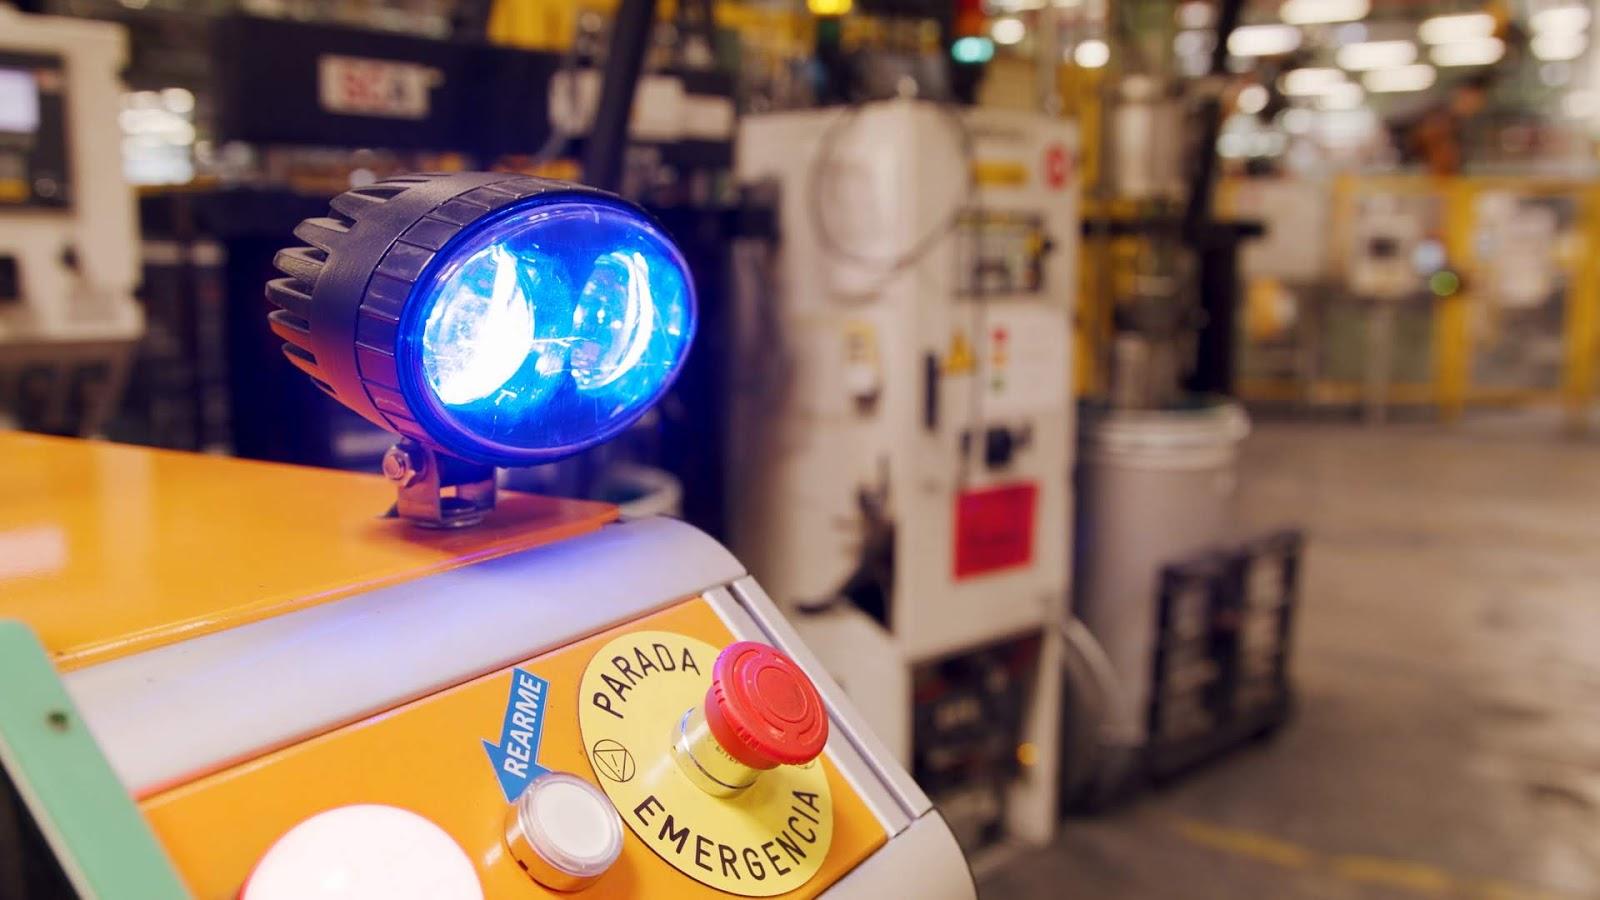 Ford SelfDrivingRobot 8 1 Η Ford έφτιαξε ένα ρομπότ για τις χαμαλοδουλειές του εργοστασίου της! Ford, video, videos, Εργοστάσιο, Τεχνολογία